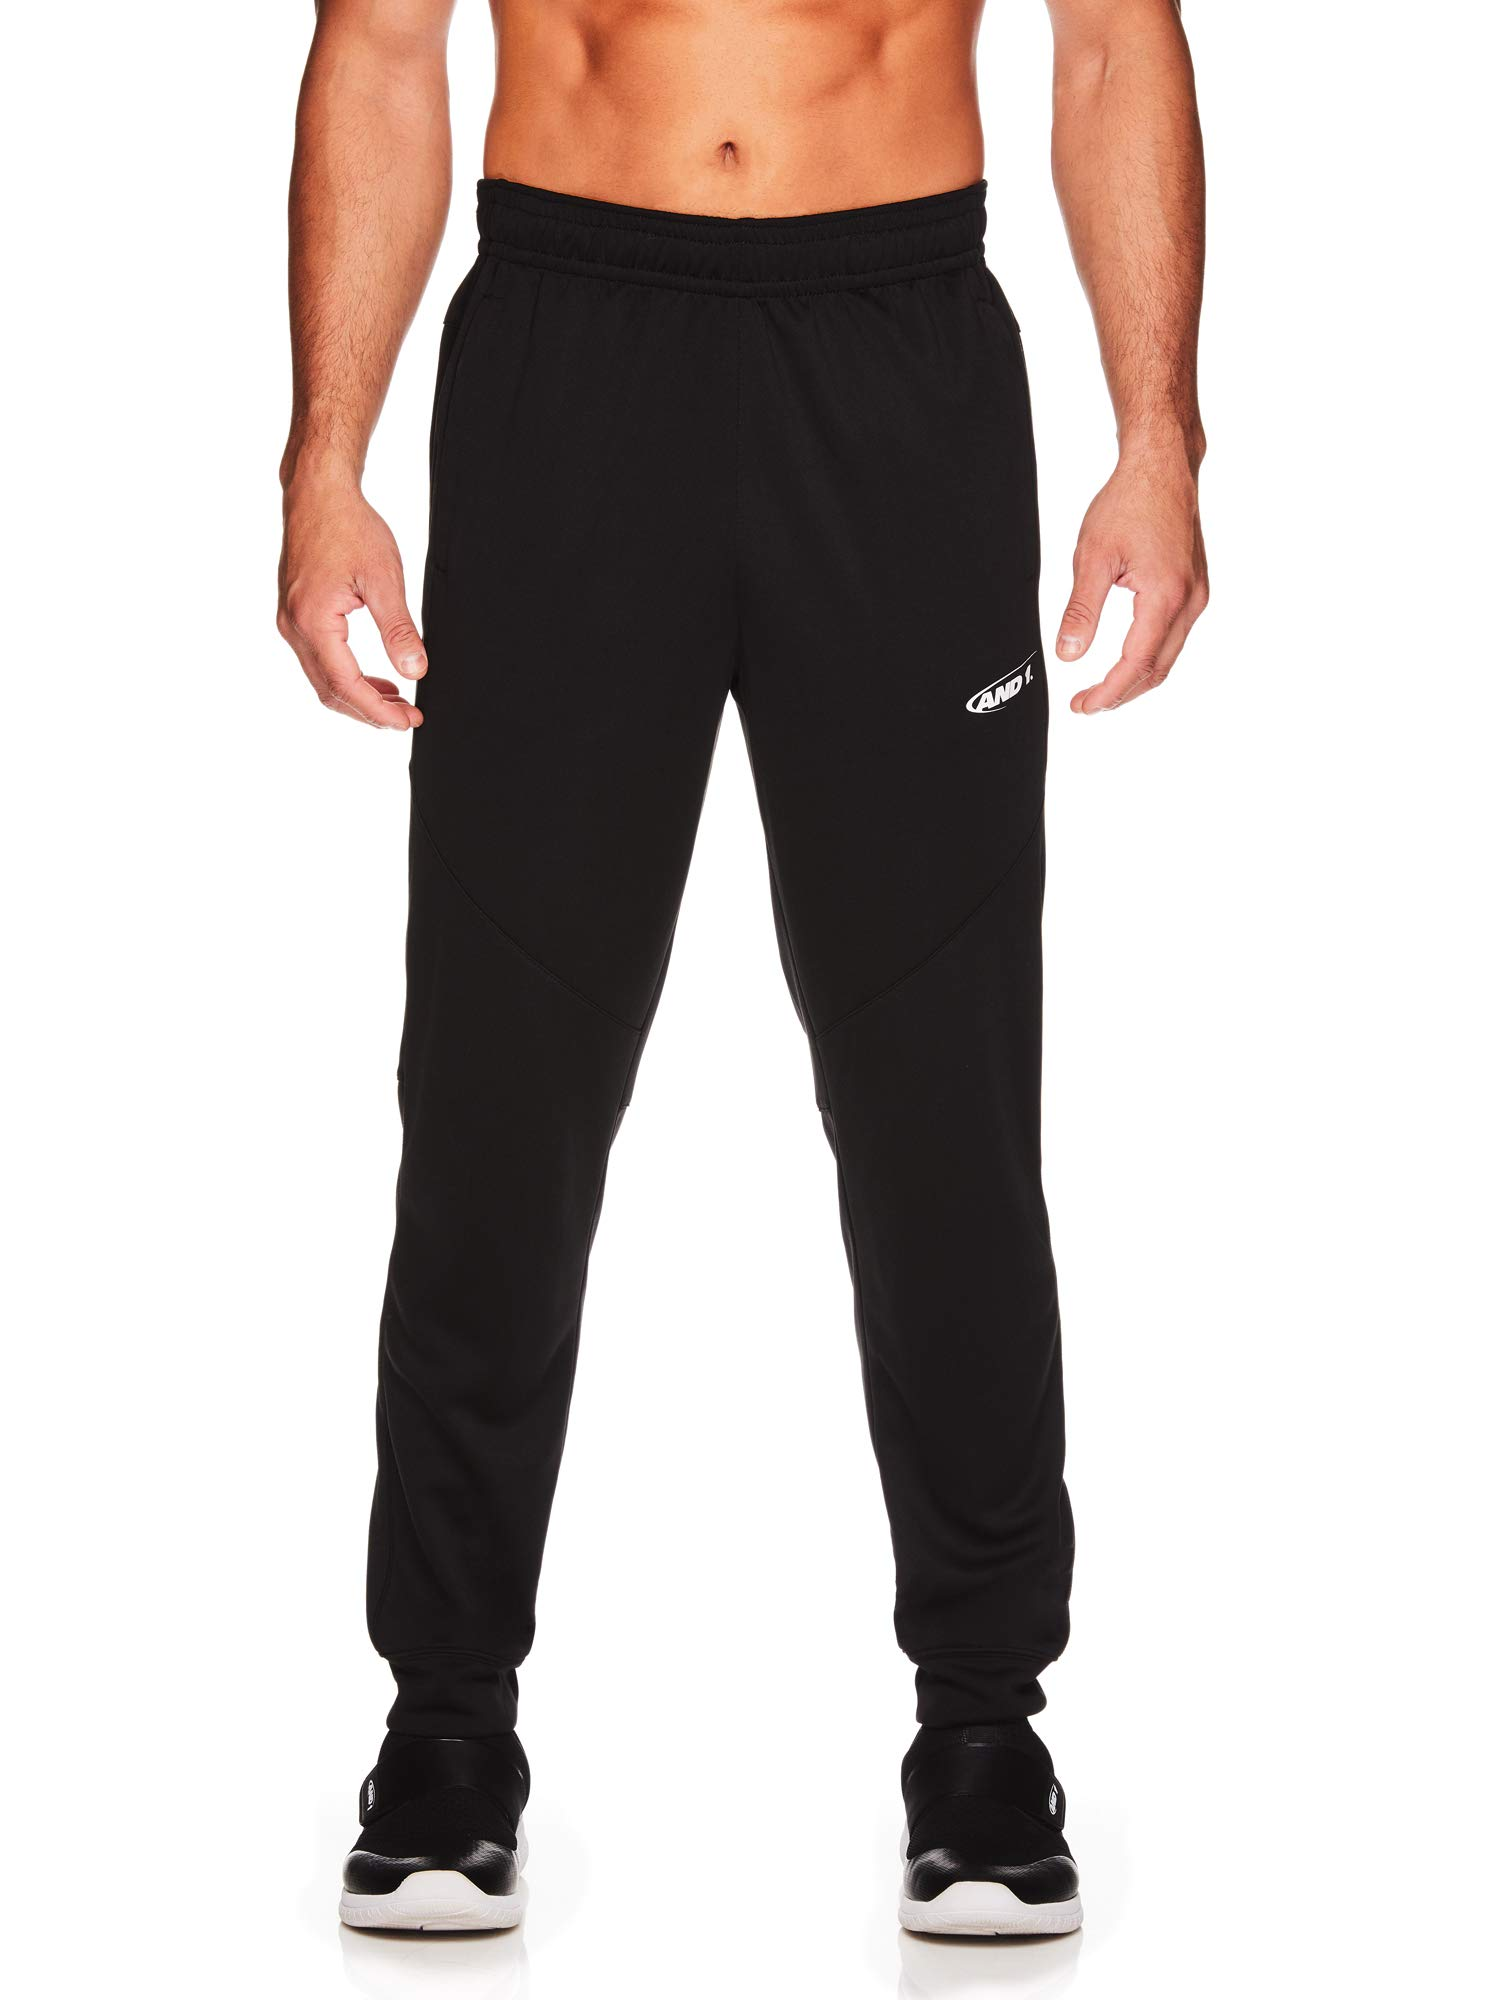 AND1 Men's Tricot Jogger Pants - Basketball Running & Jogging Sweatpants w/Pockets - Black, Small